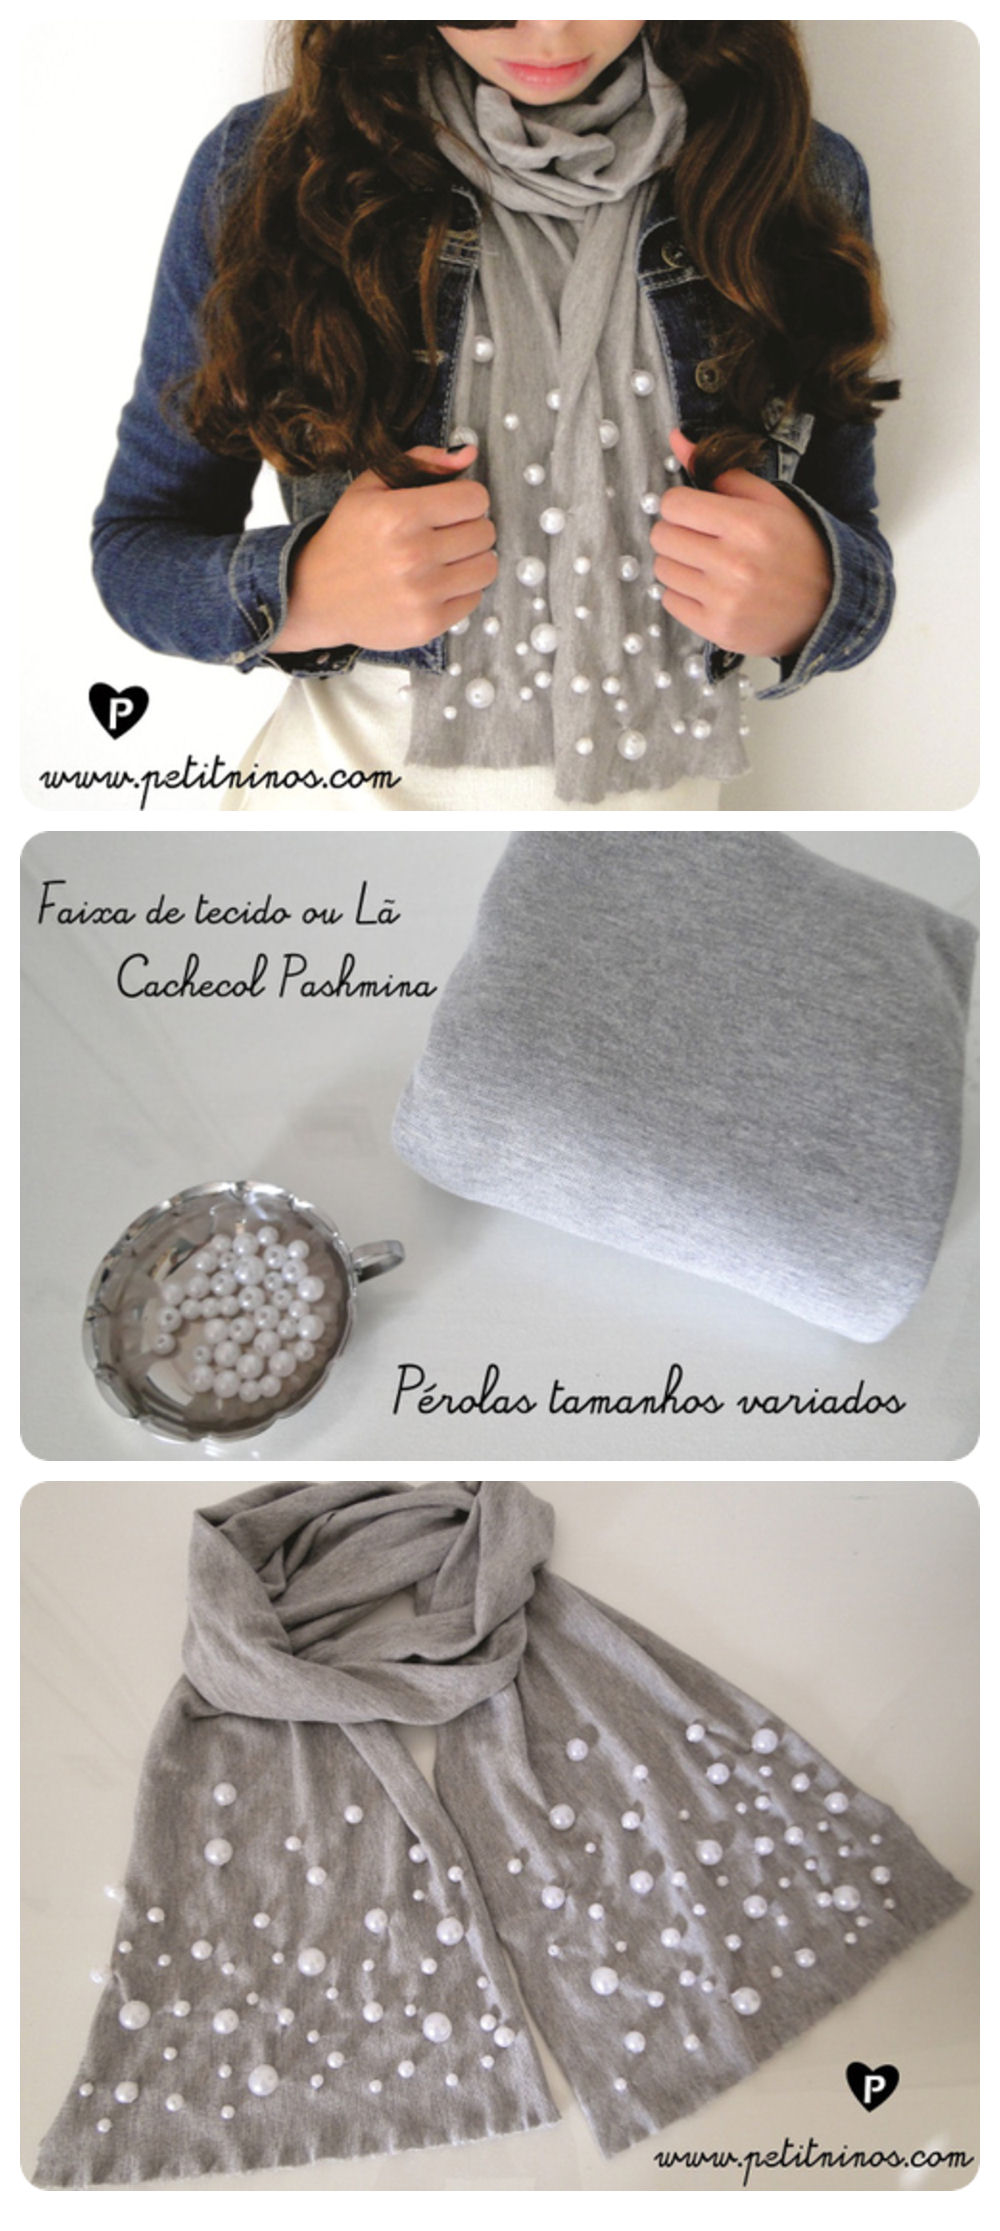 How To Sew Beads Onto Fabric : beads, fabric, Beaded, Clothing, Embellishment, Ideas